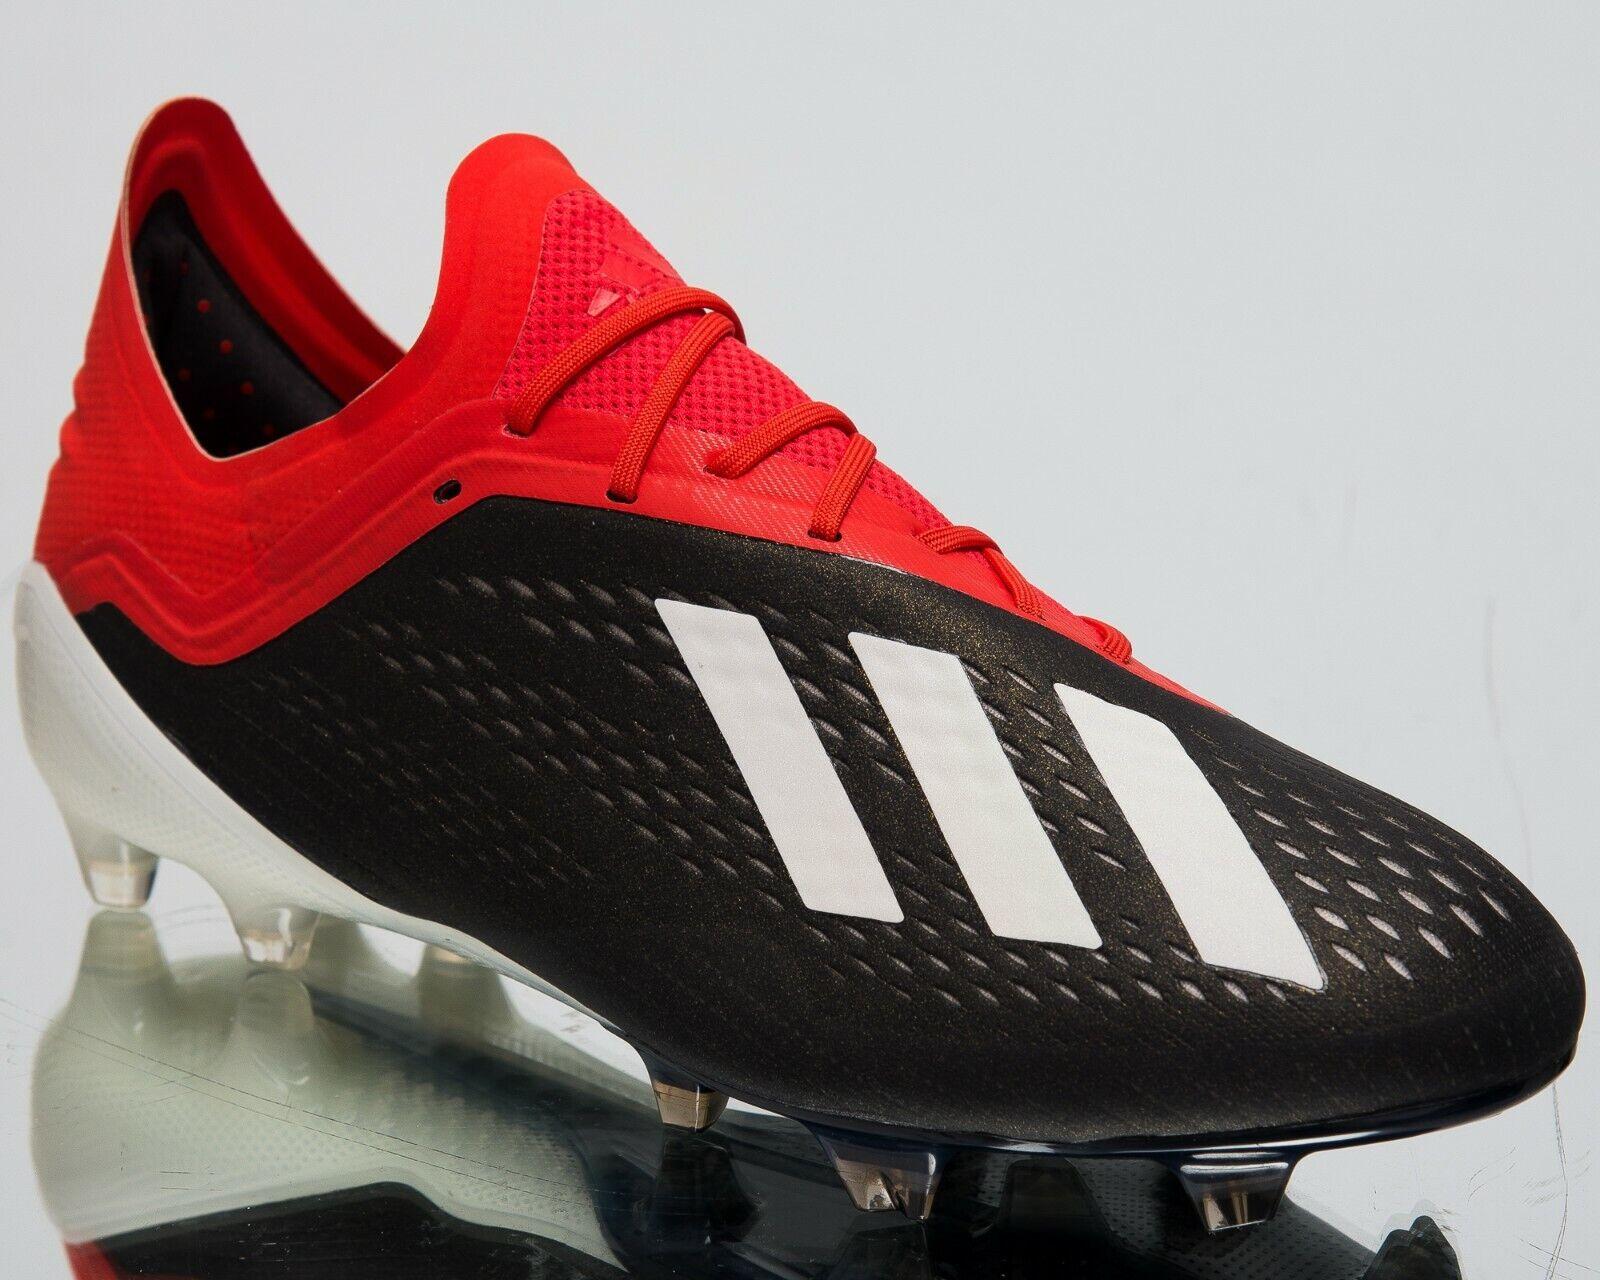 Adidas X 18.1 FG New Mens Soccer shoes Core Black Footwear White Red 195g BB9345